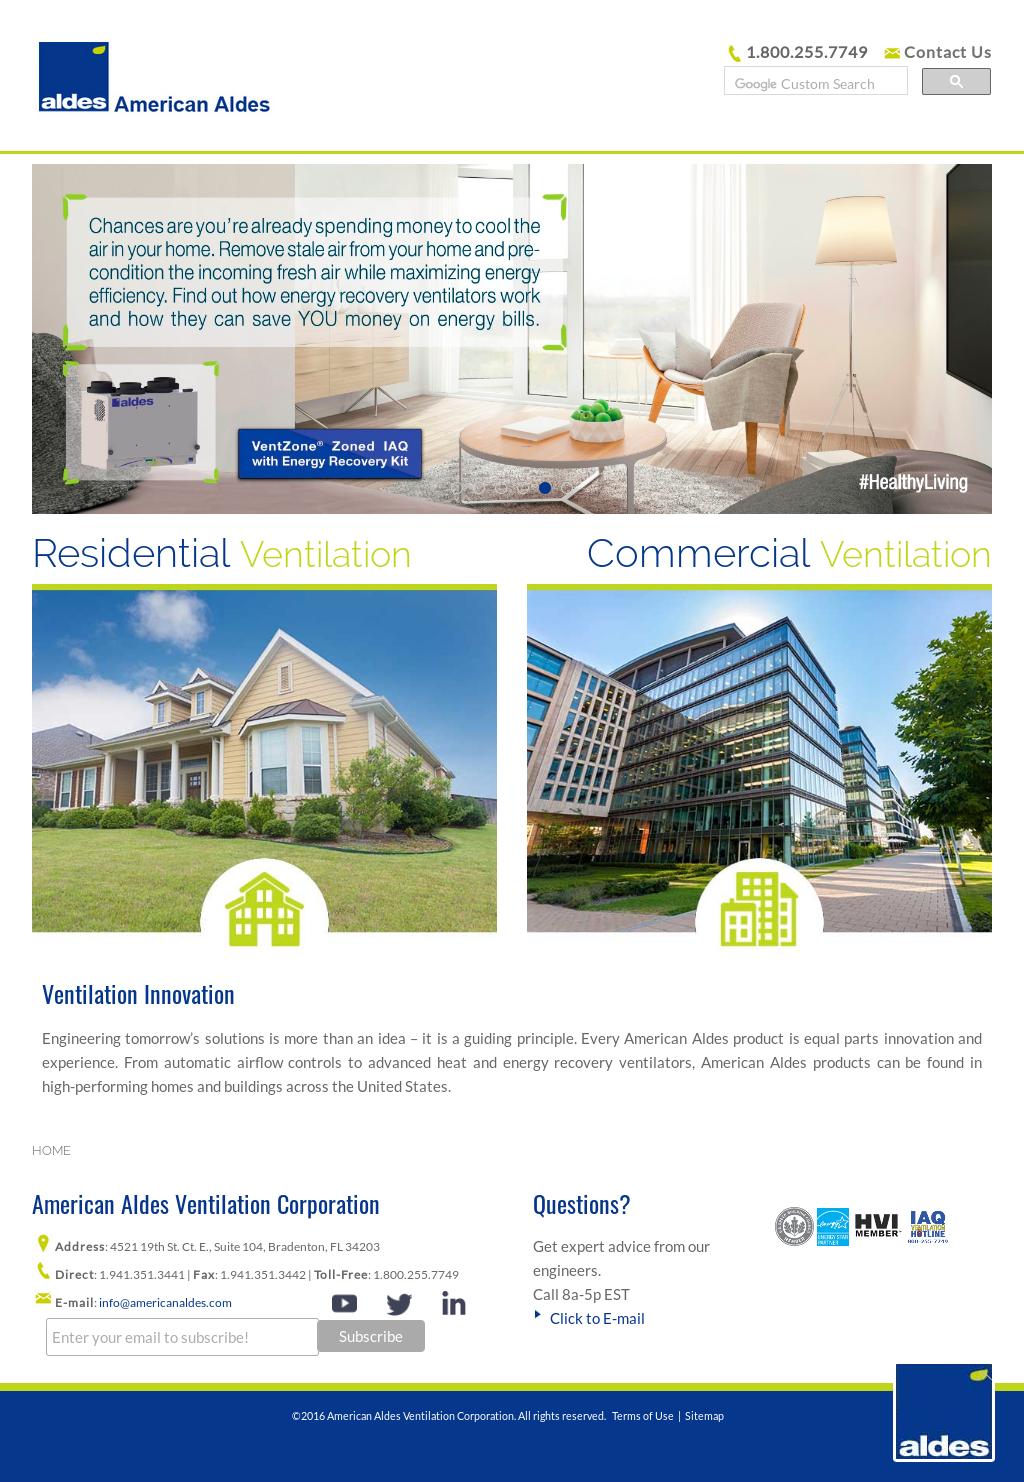 American ALDES Ventilation Competitors, Revenue and